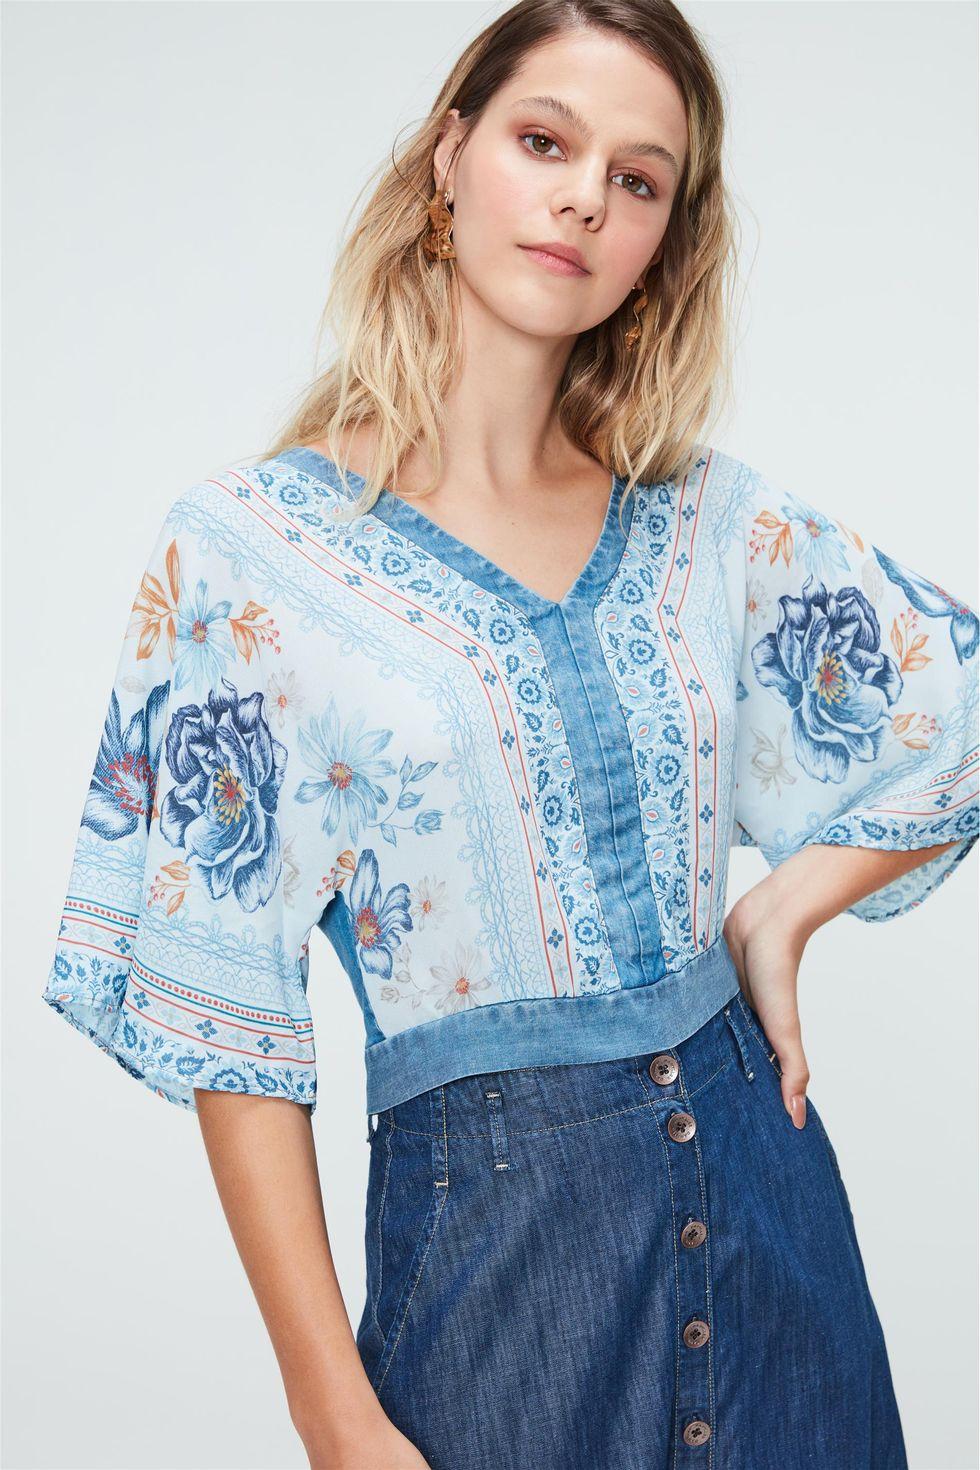 Blusa-Solta-Jeans-Estampa-de-Flores-Azul-Frente--